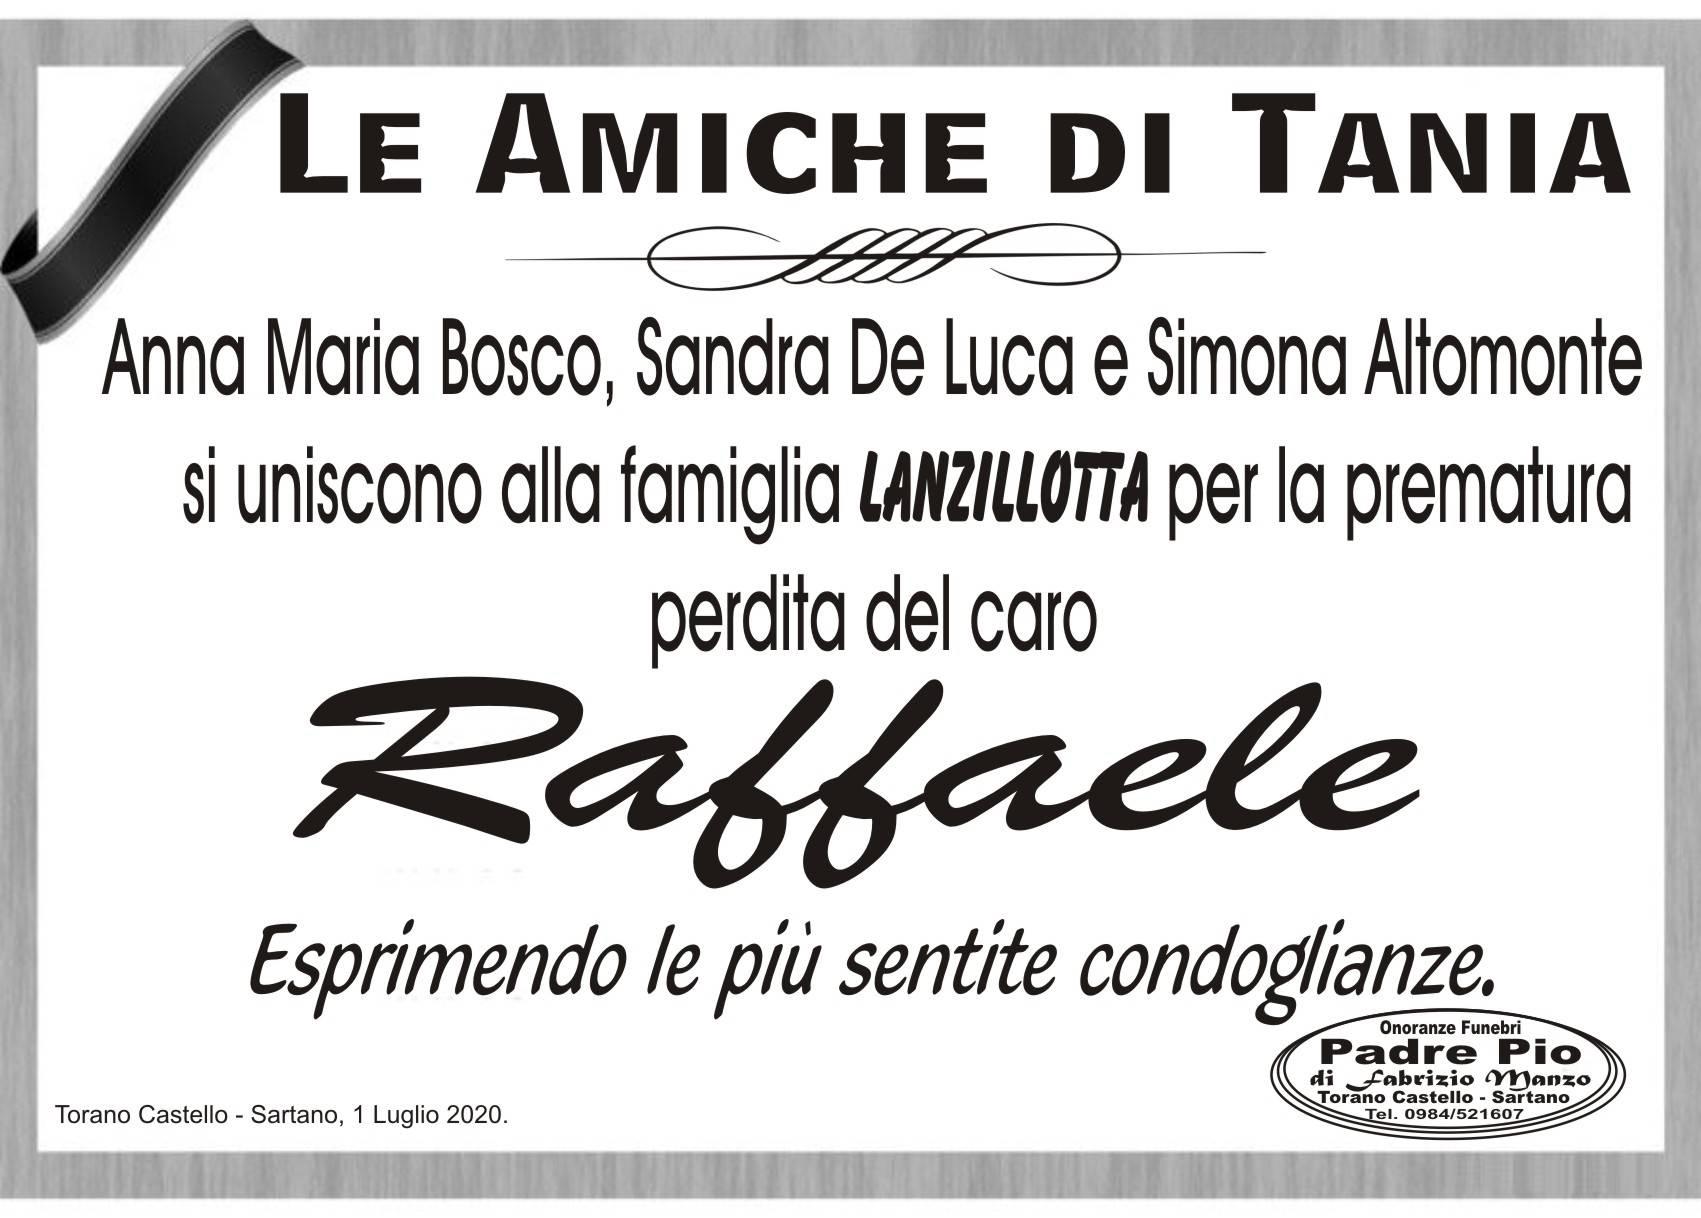 Raffaele Lanzillotta (P1)